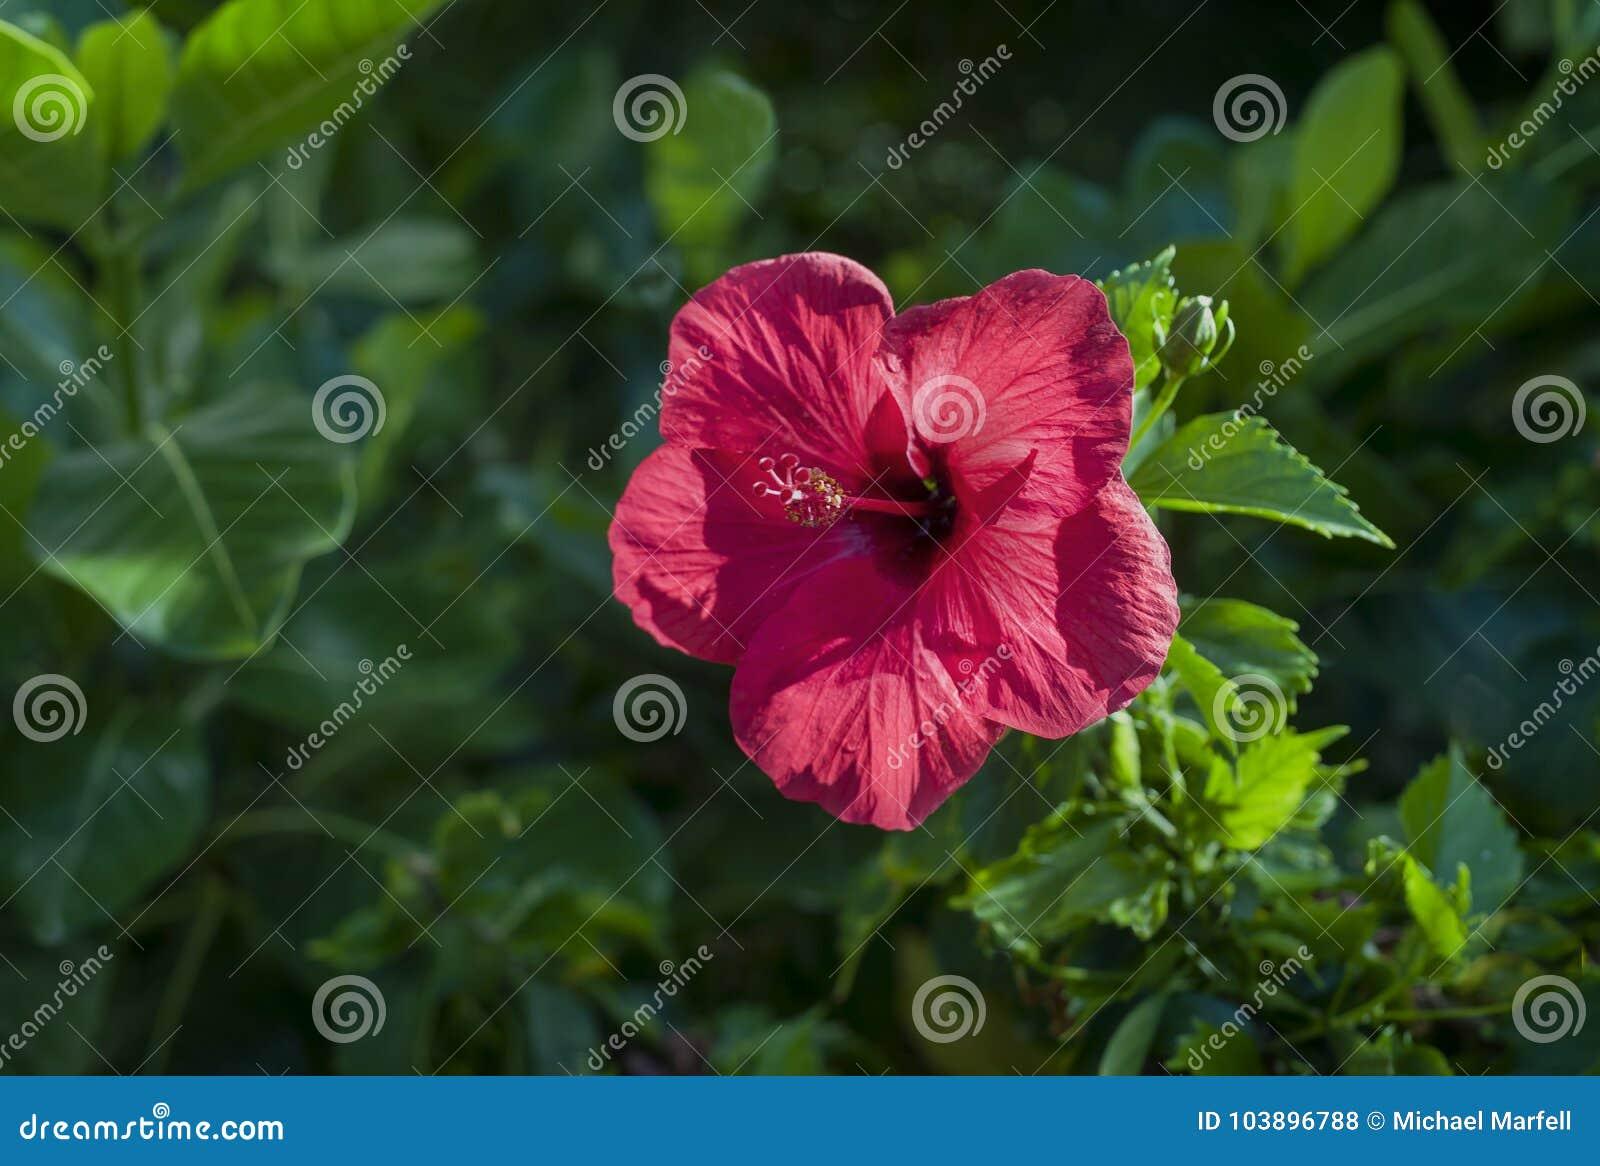 Red hawaiian hibiscus stock photo image of blossoming 103896788 red hawaiian hibiscus izmirmasajfo